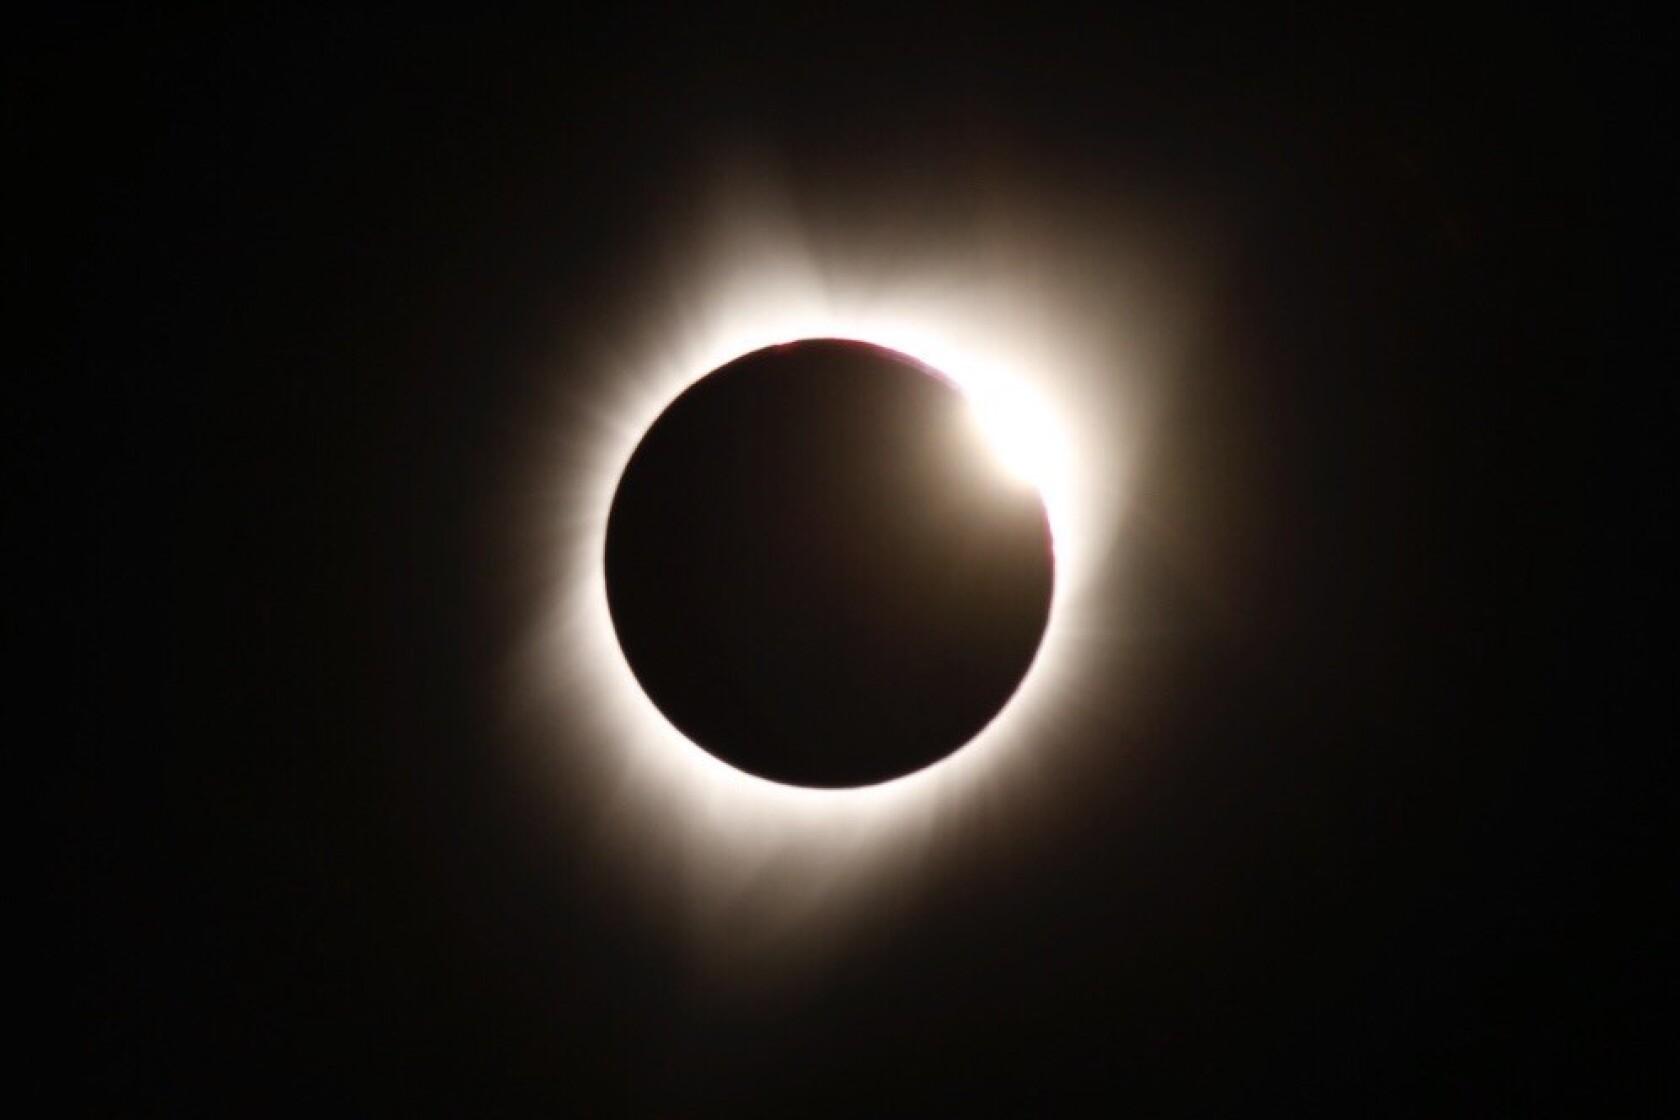 Total Solar Eclipse 2017 Grown Travel Hat